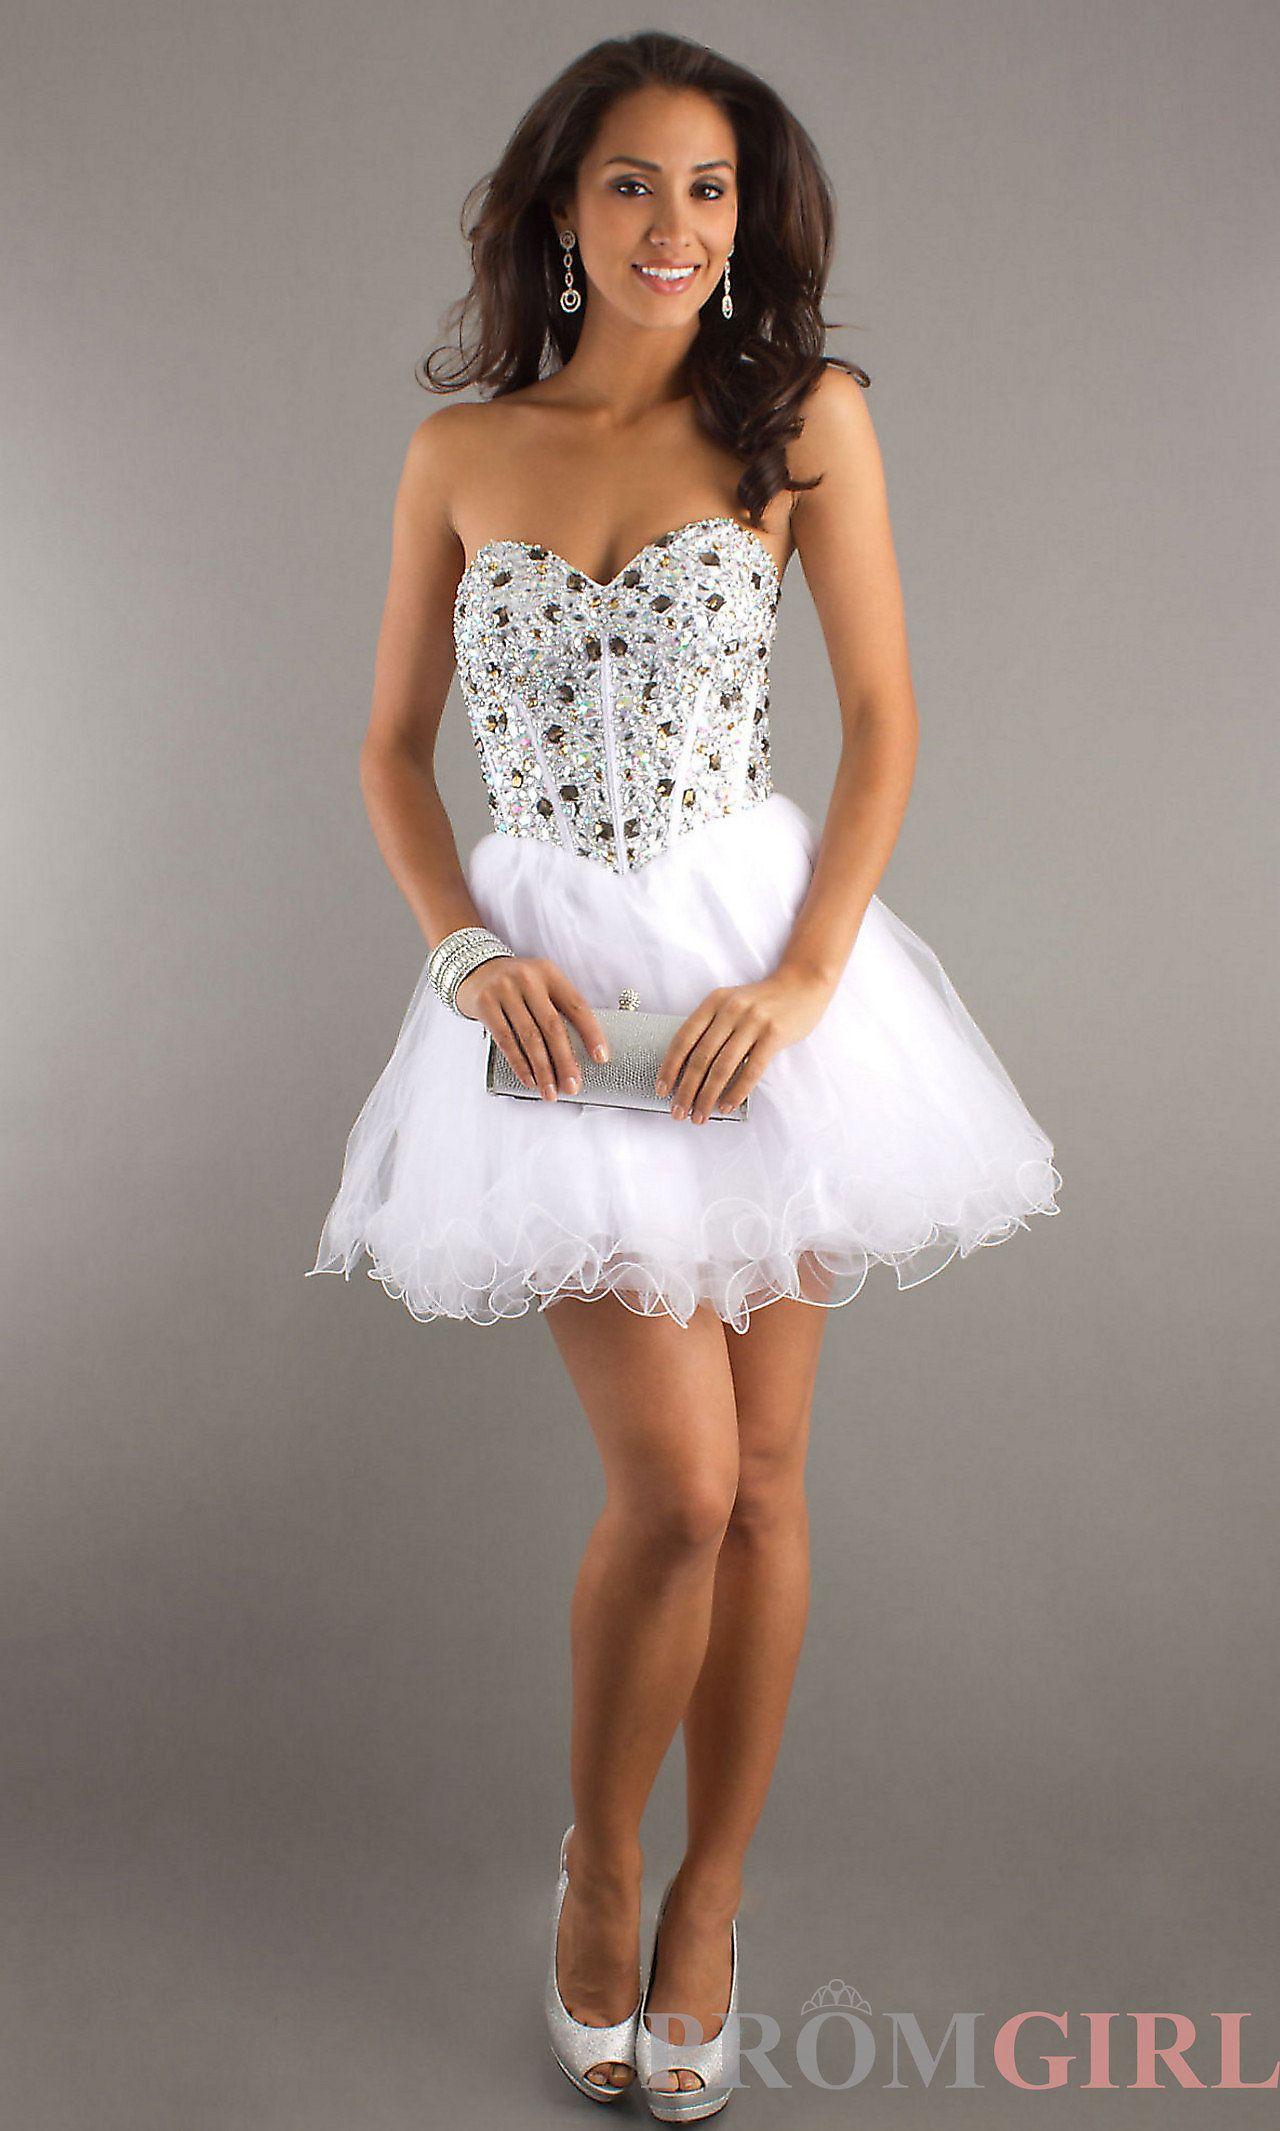 Frontview Short Dresses Pinterest Court Dresses Sweet 16 And